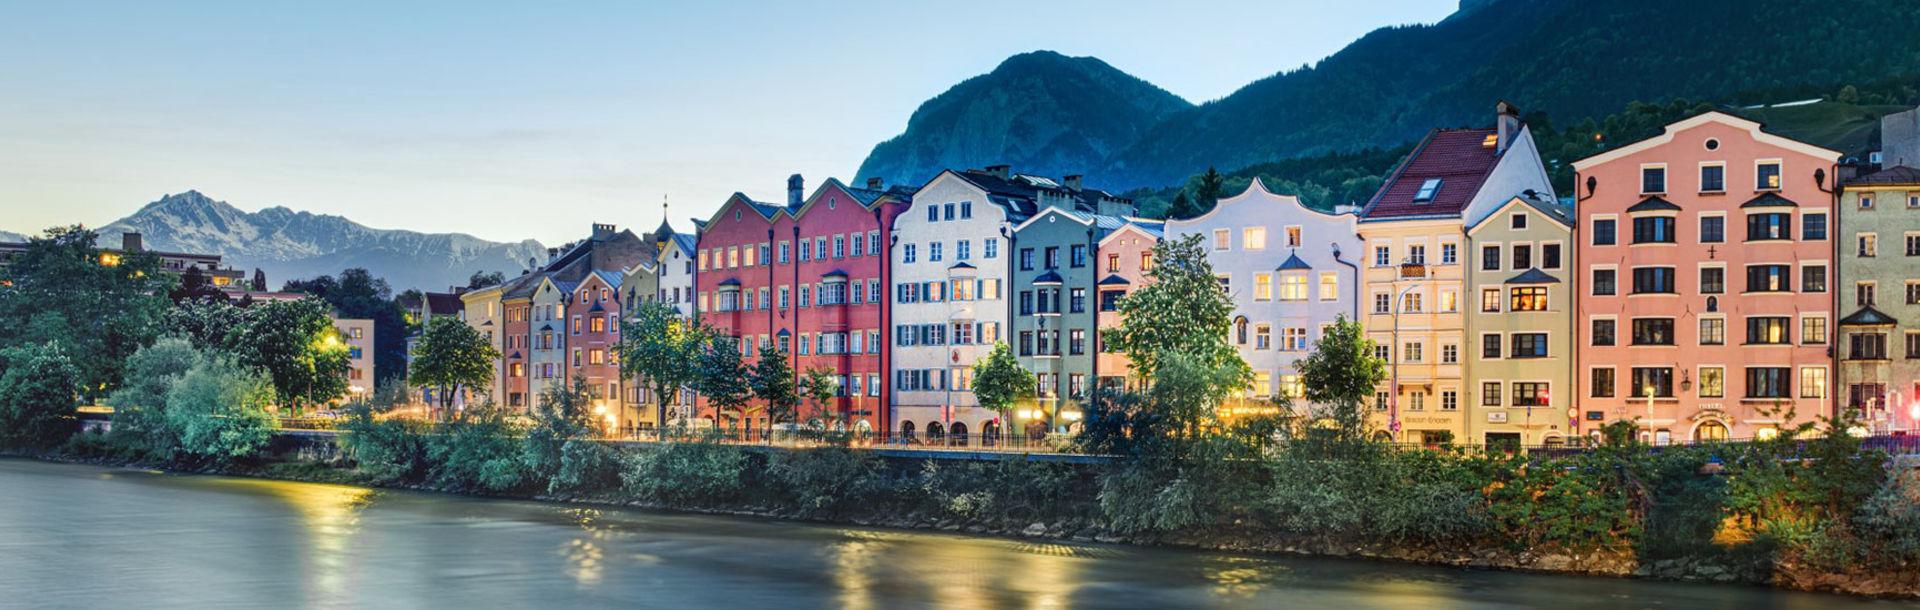 Innsbruck - Skyline am Inn